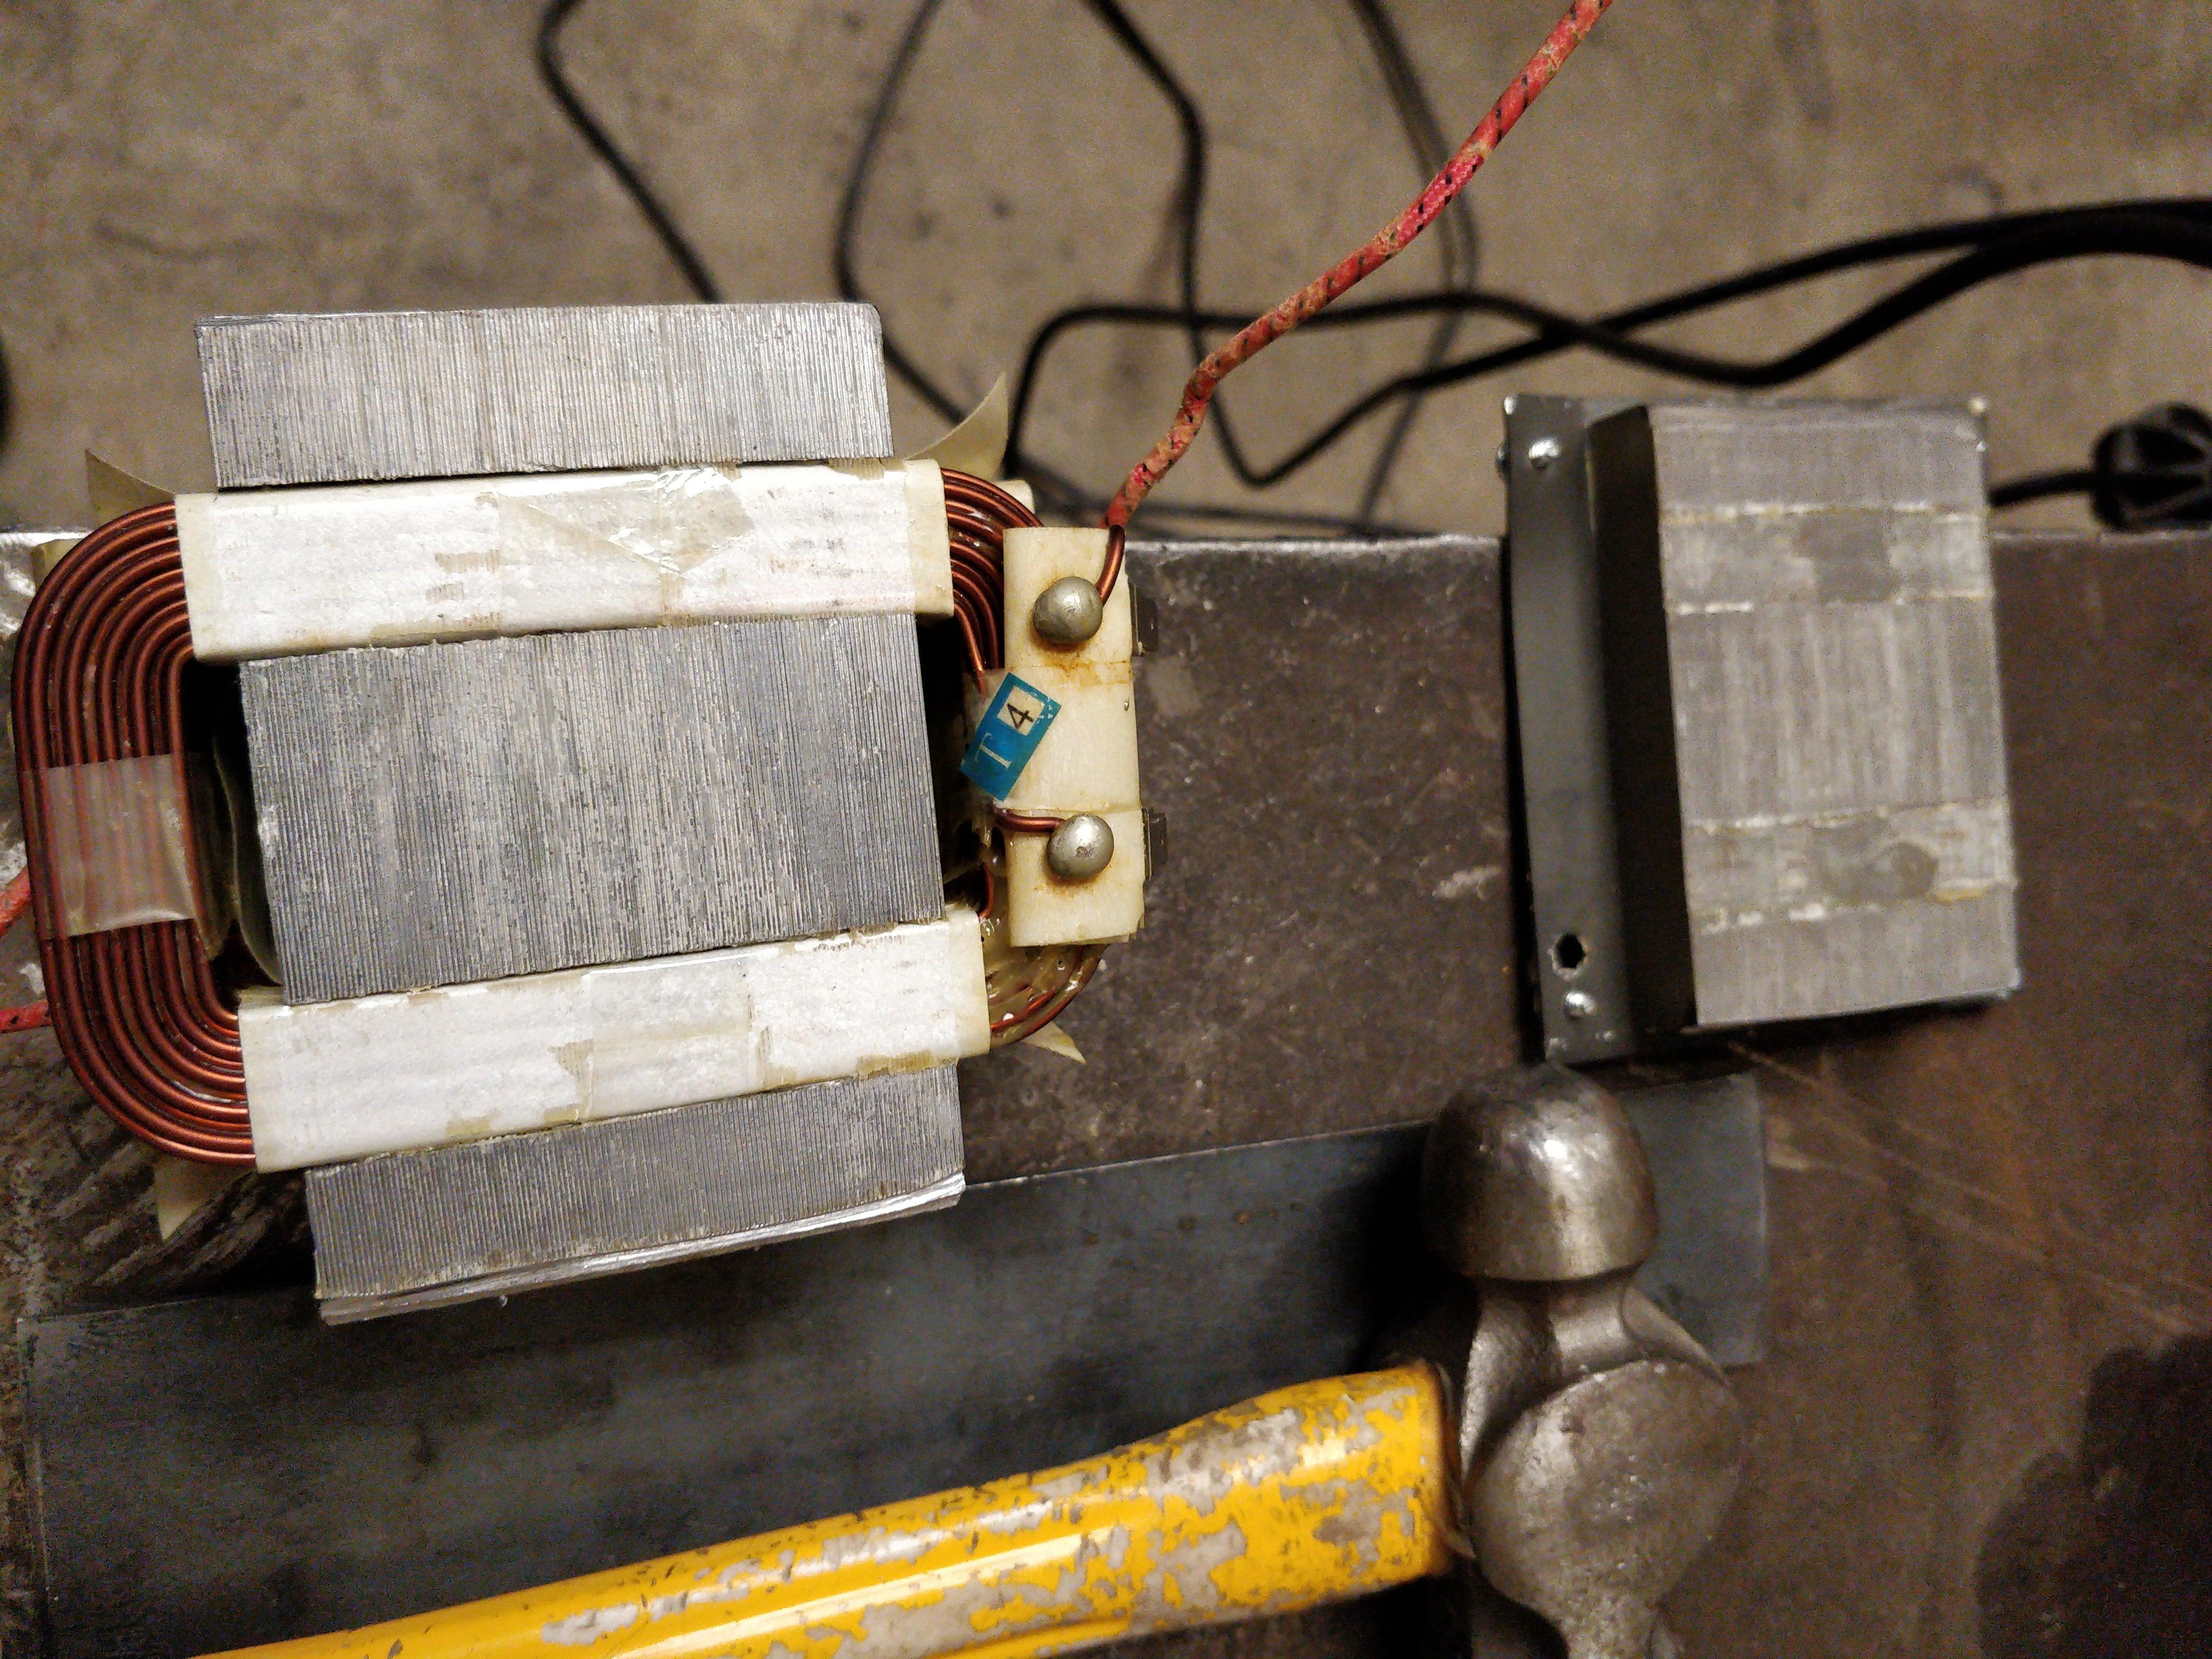 Lot of 5 Random High Voltage Microwave Transformers RESALE DIY BUILDER *TESTED*